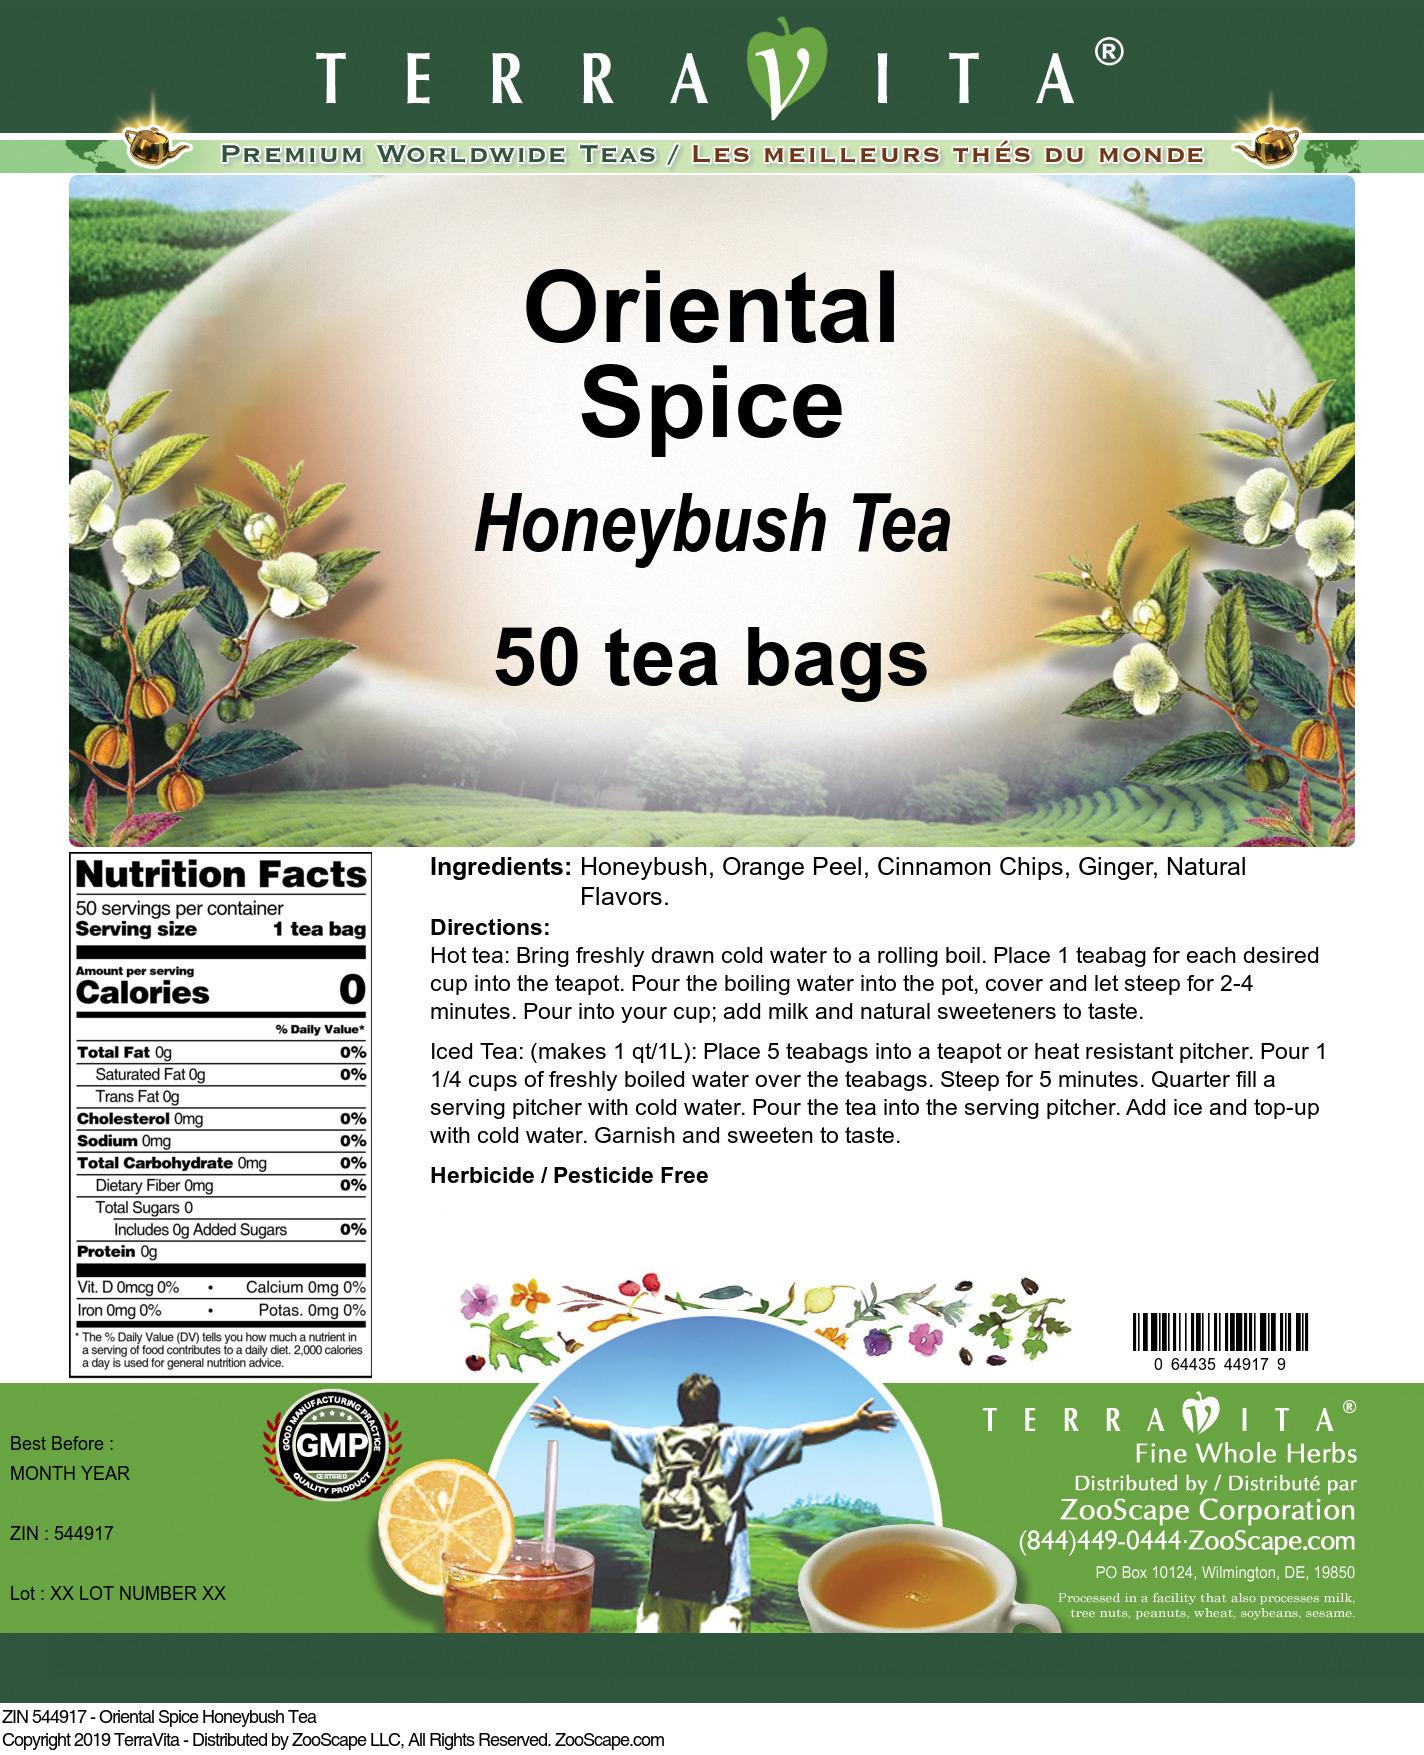 Oriental Spice Honeybush Tea